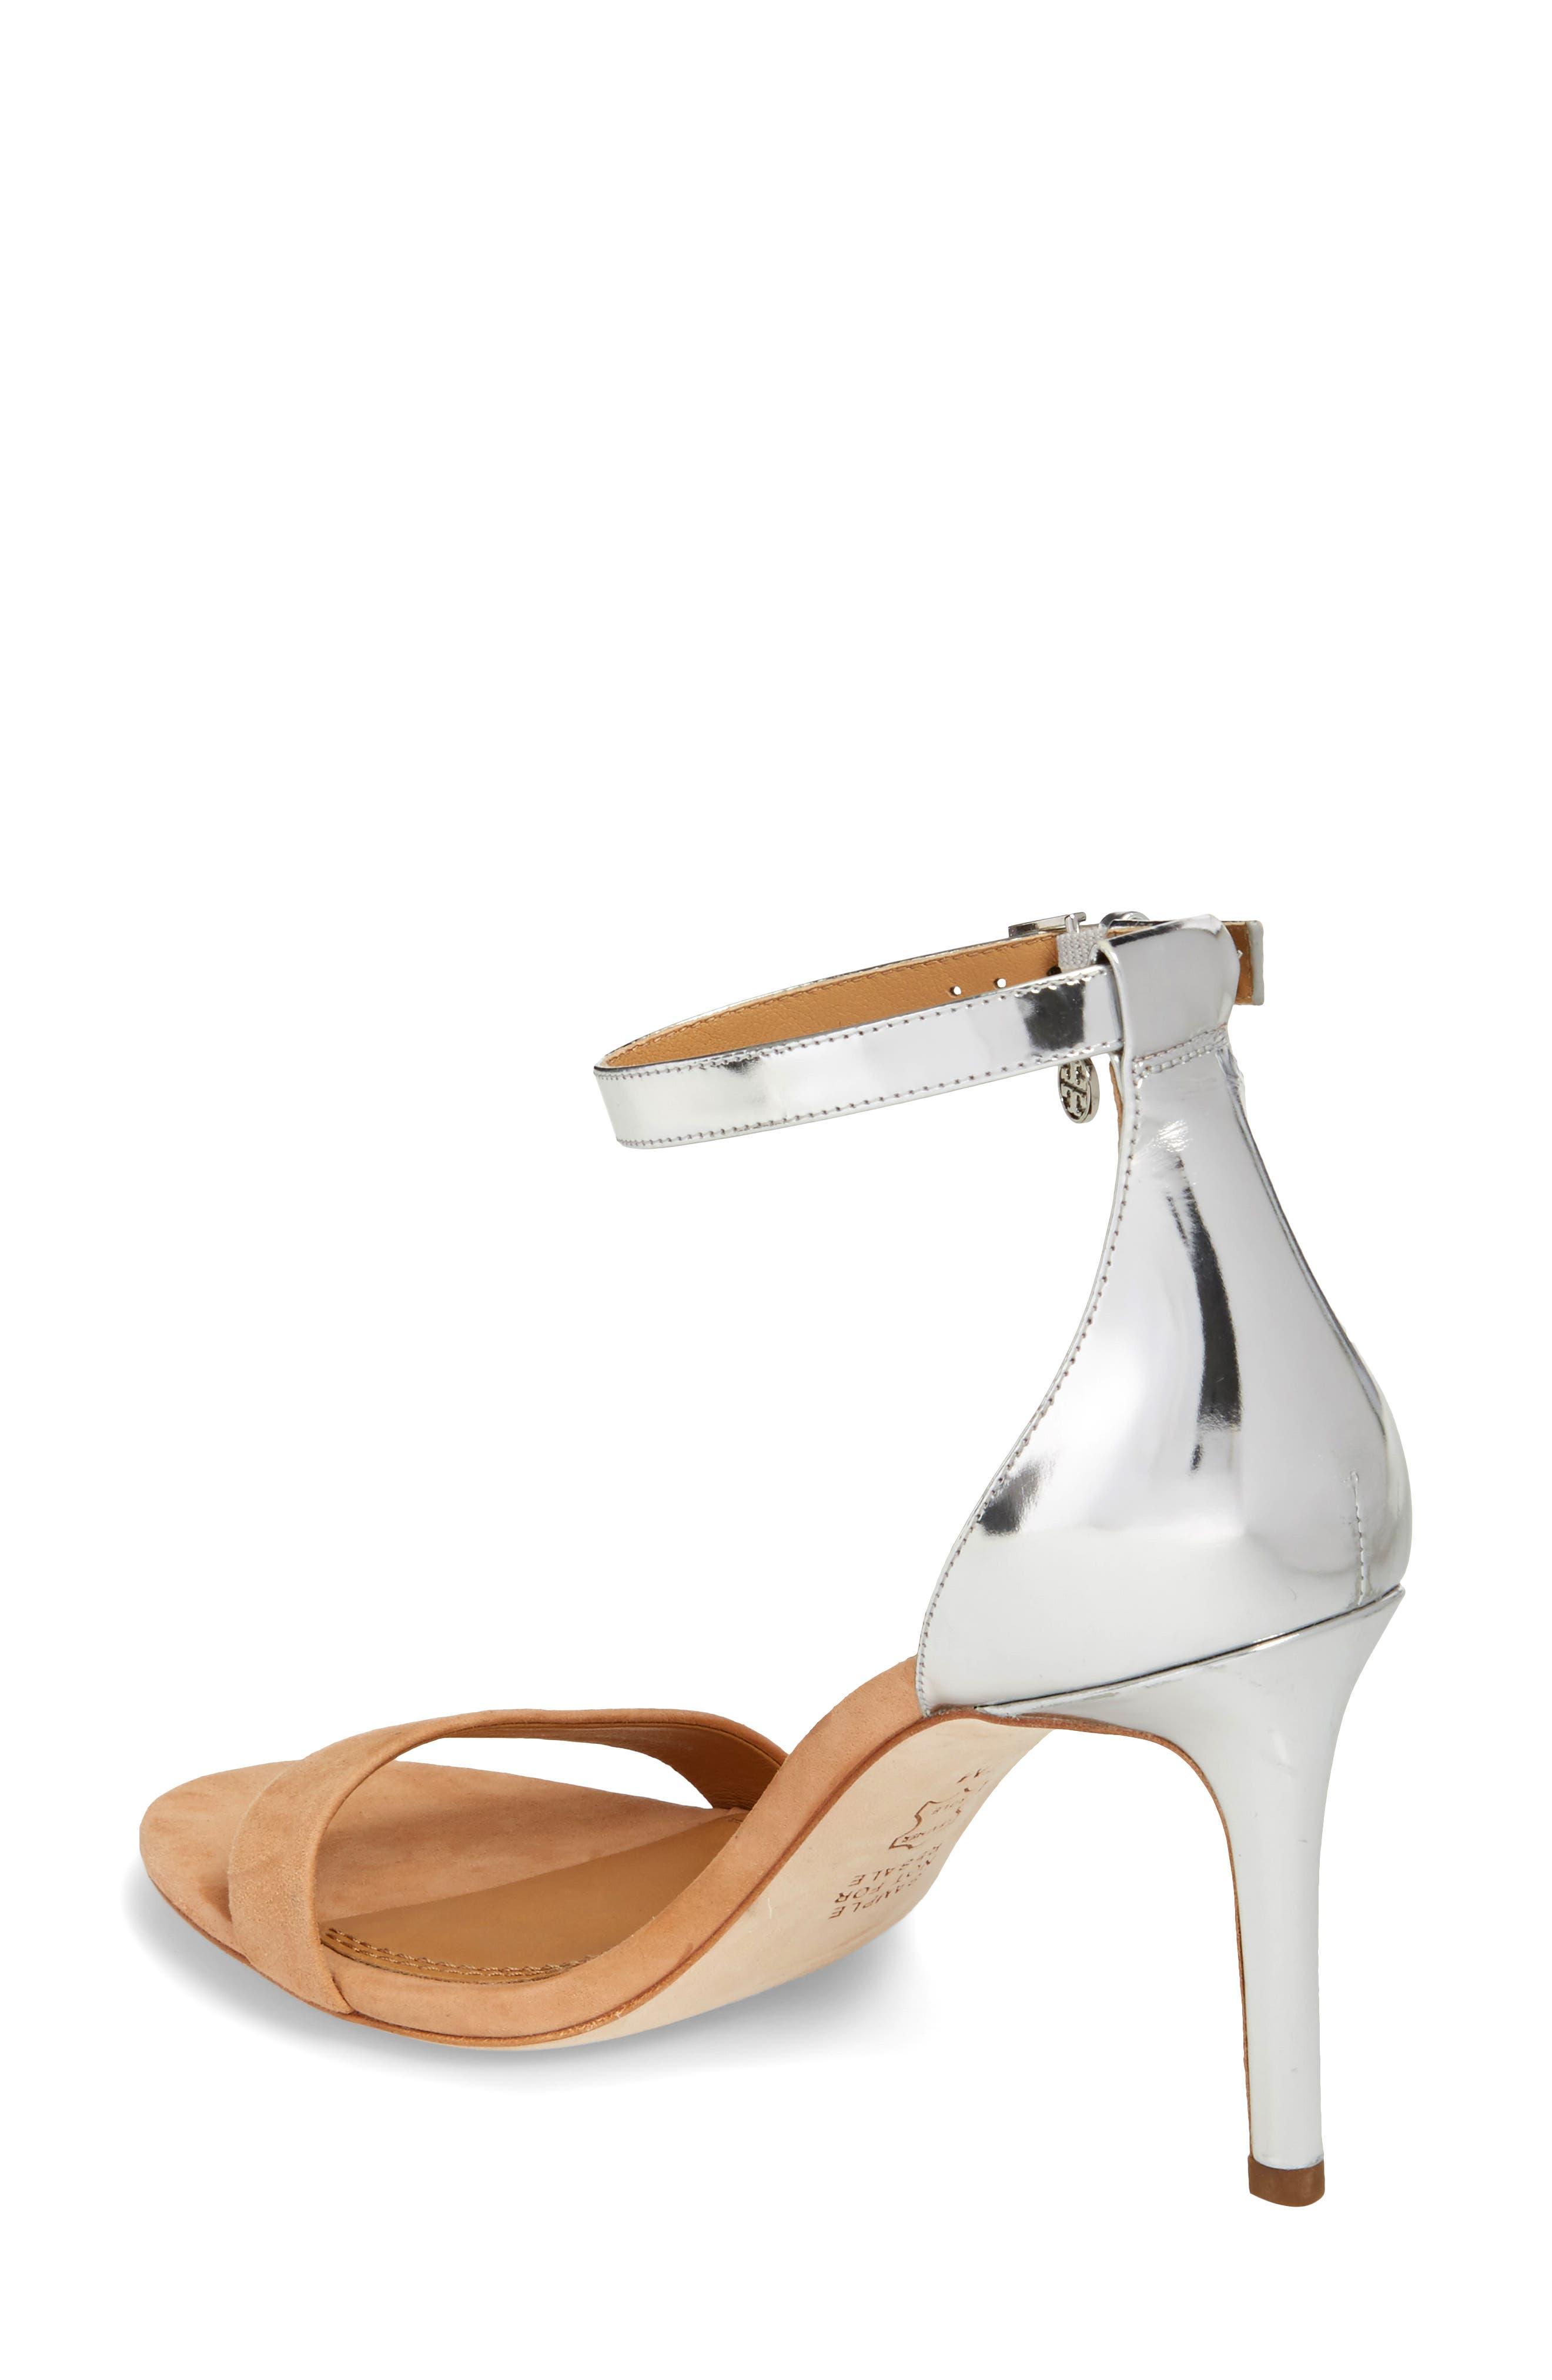 Ellie Ankle Strap Sandal,                             Alternate thumbnail 2, color,                             020